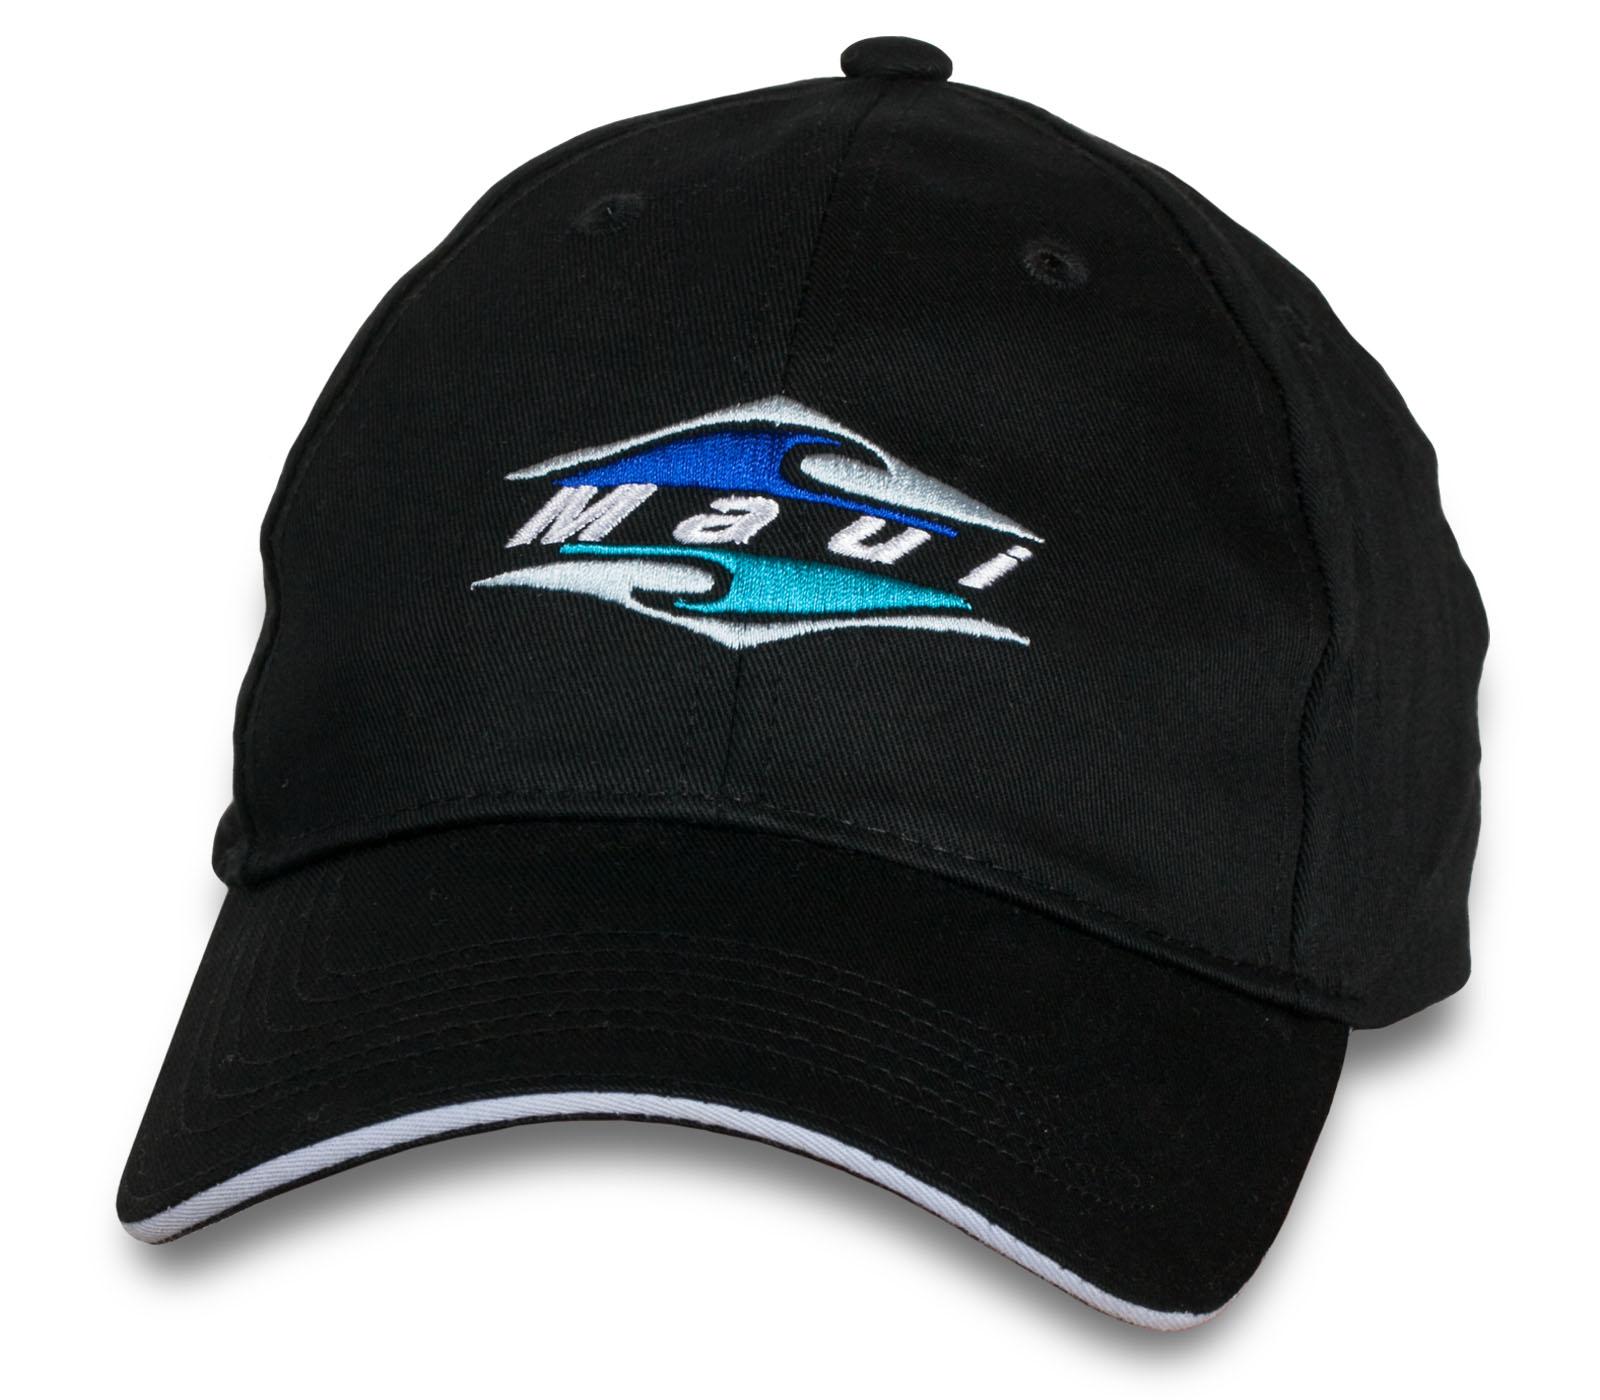 Летняя черная кепка Maui.